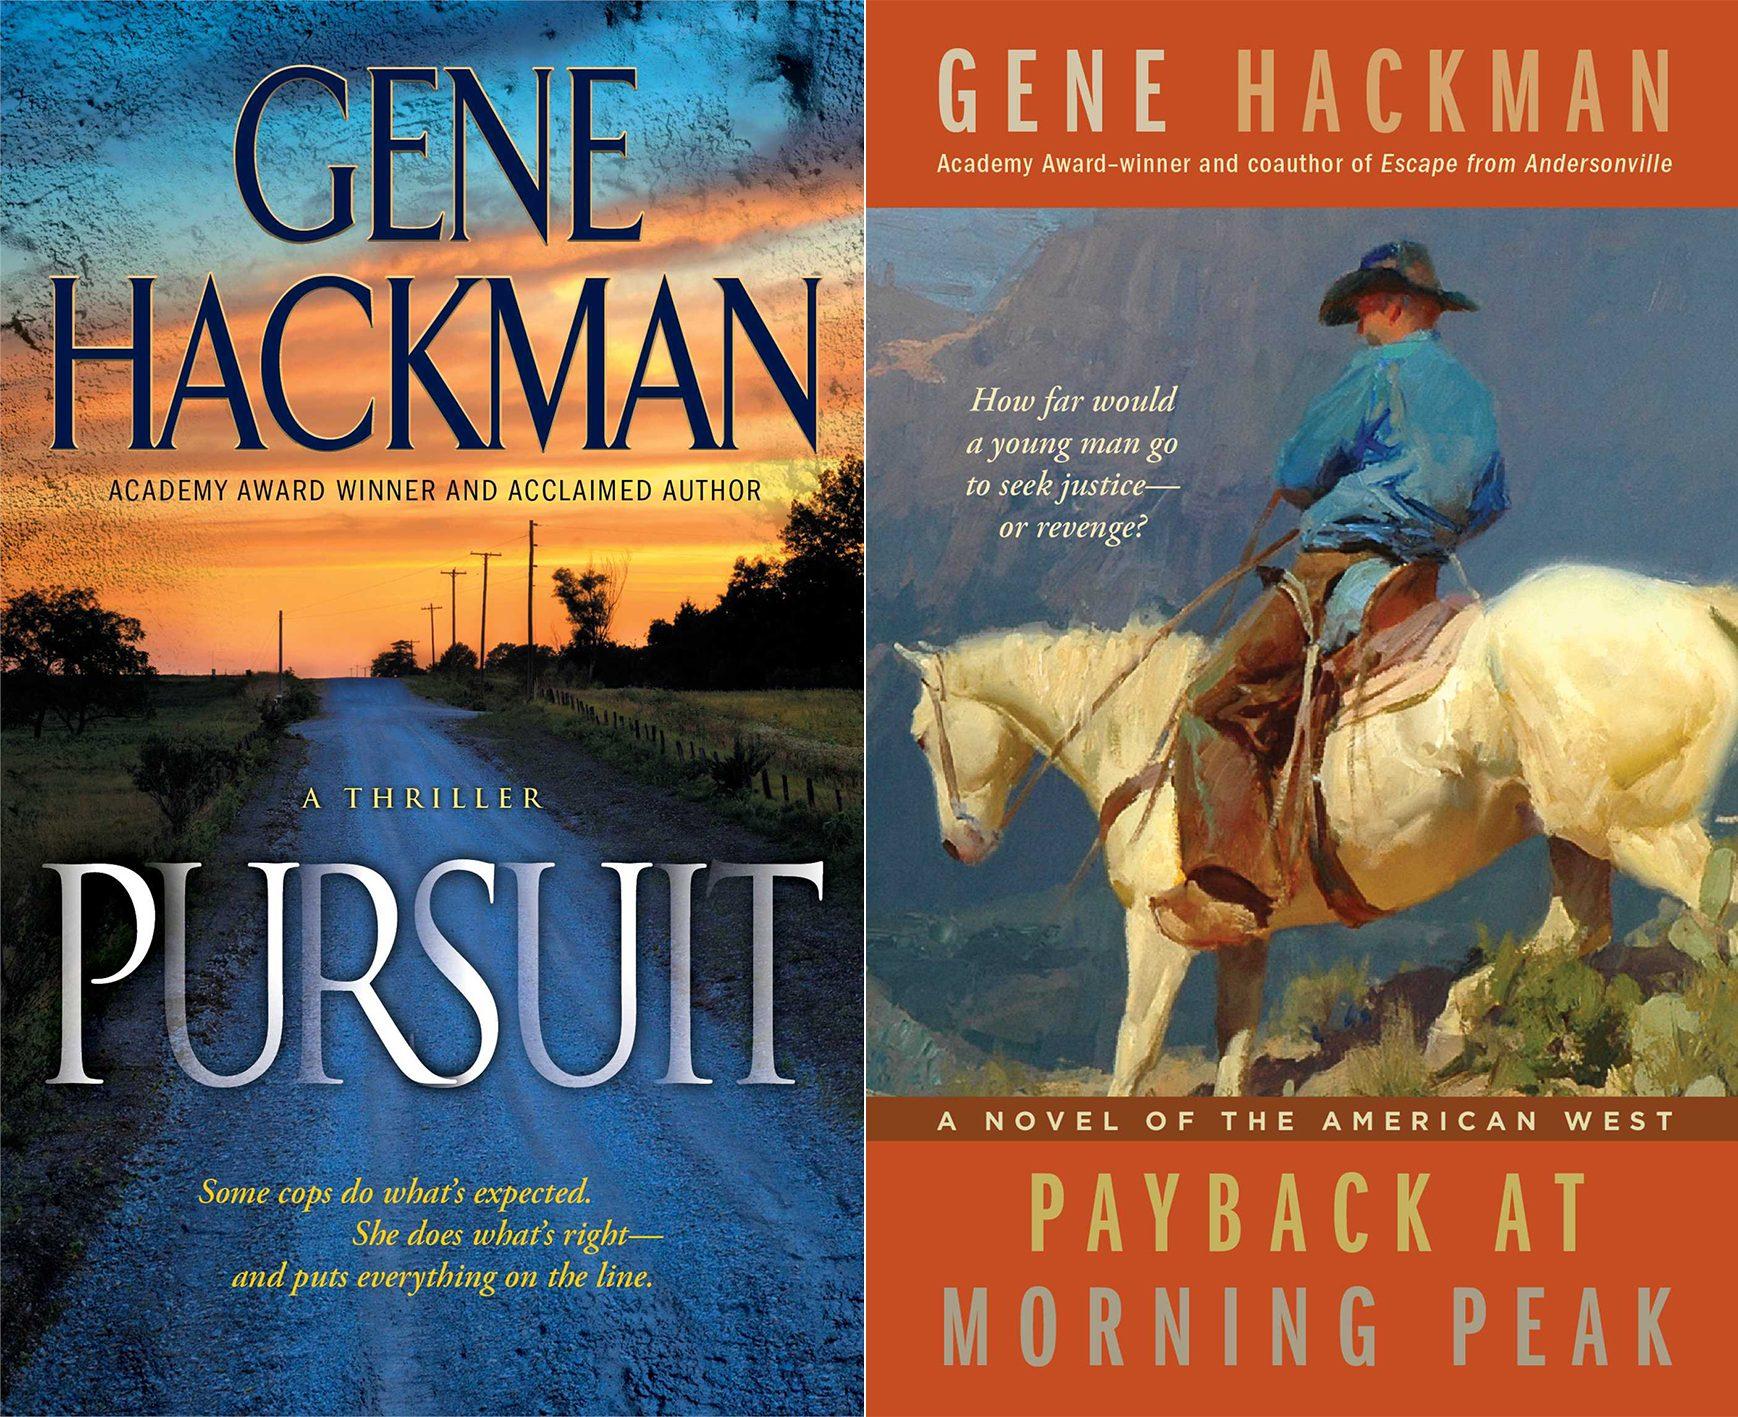 Gene Hackman Novels e1626777123701 23 Celebrities Who Now Have 'Normal' Jobs